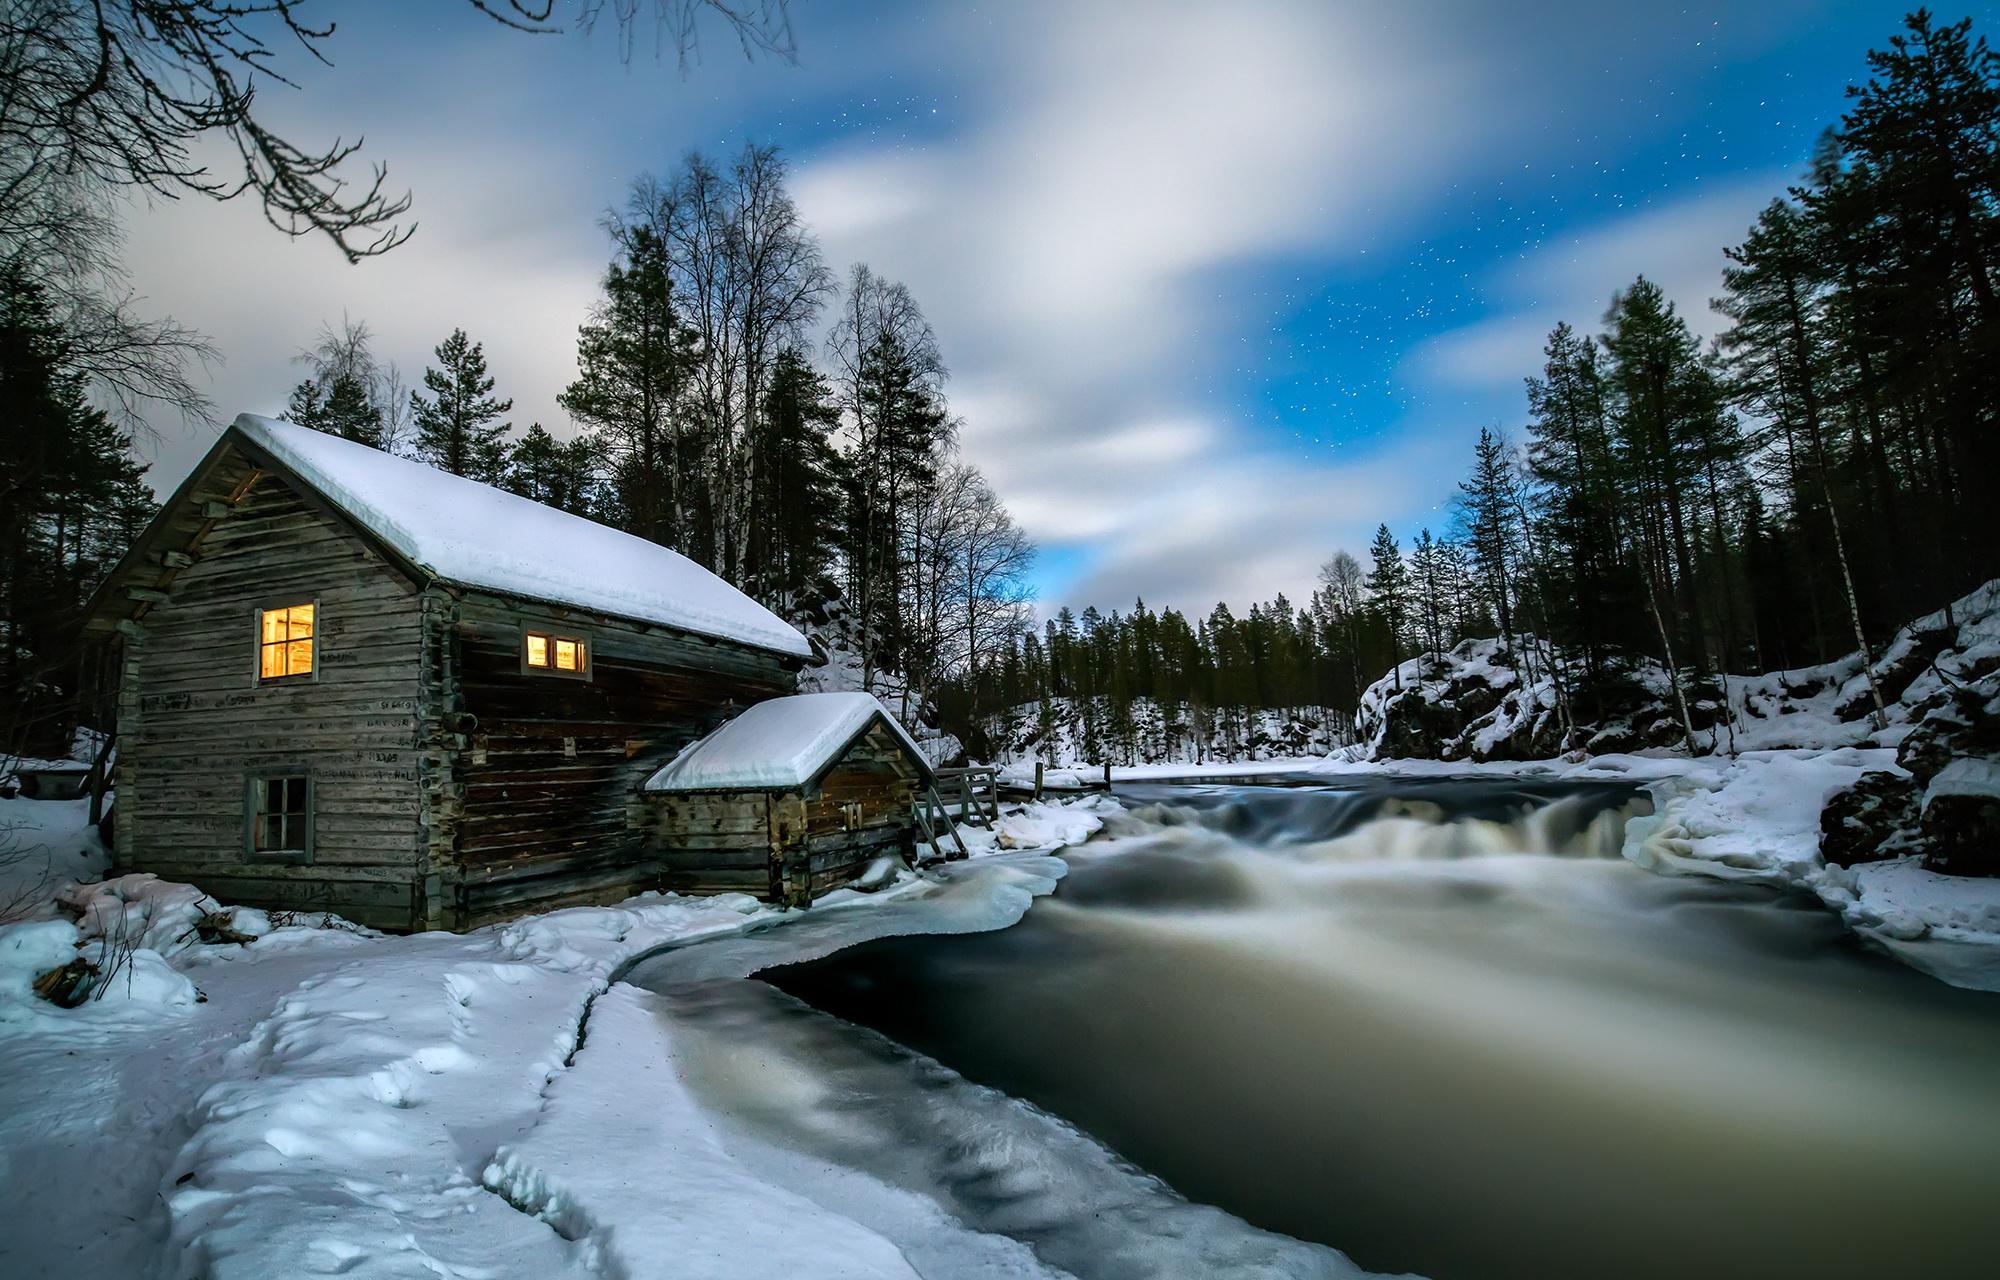 картинка зима природа с домиком пульс, вести подсчет